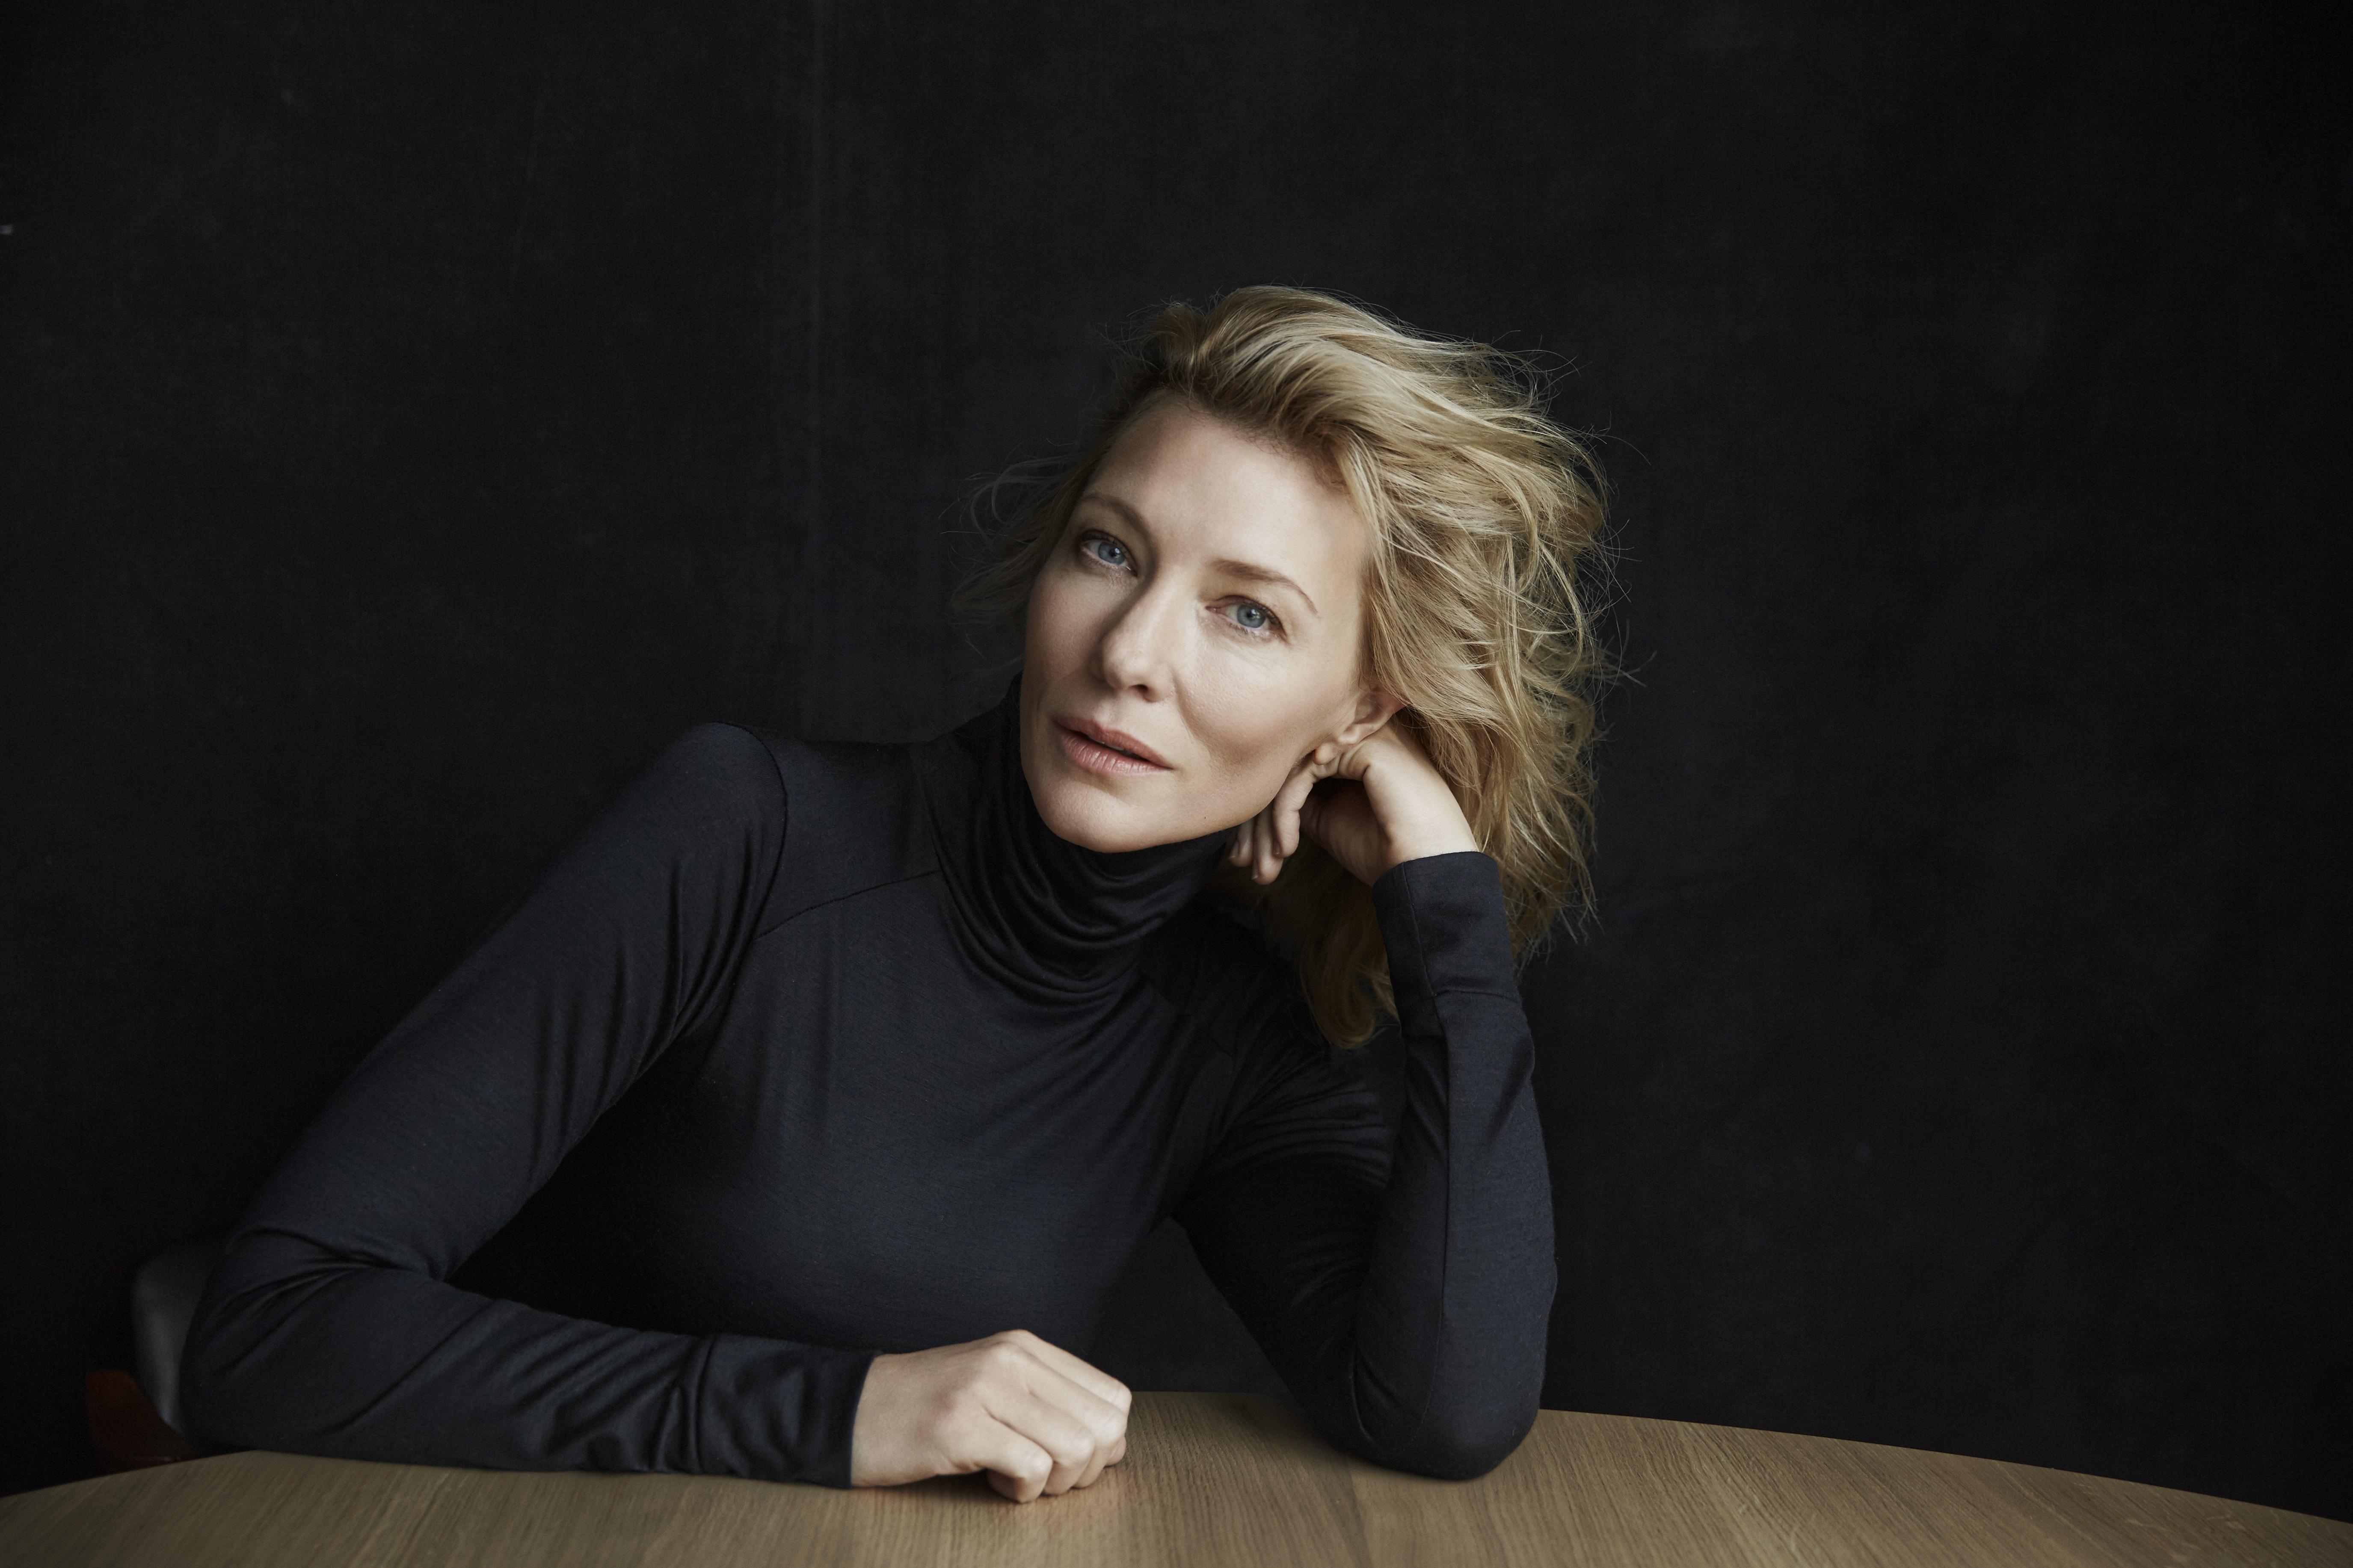 Cate Blanchett Wallpapers Hd